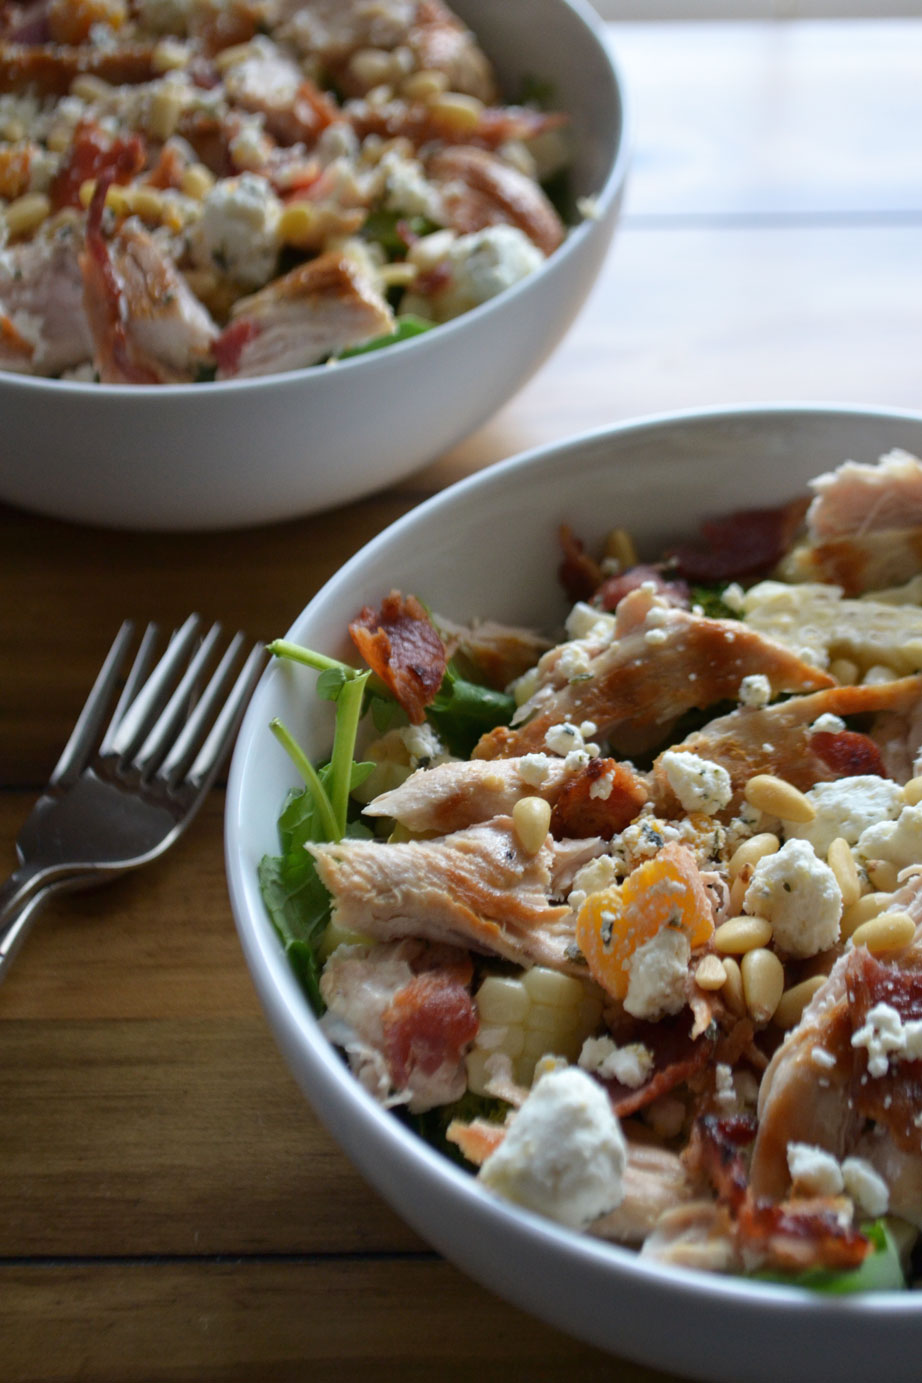 chicken-bacon-cheese-green-bowls.jpg